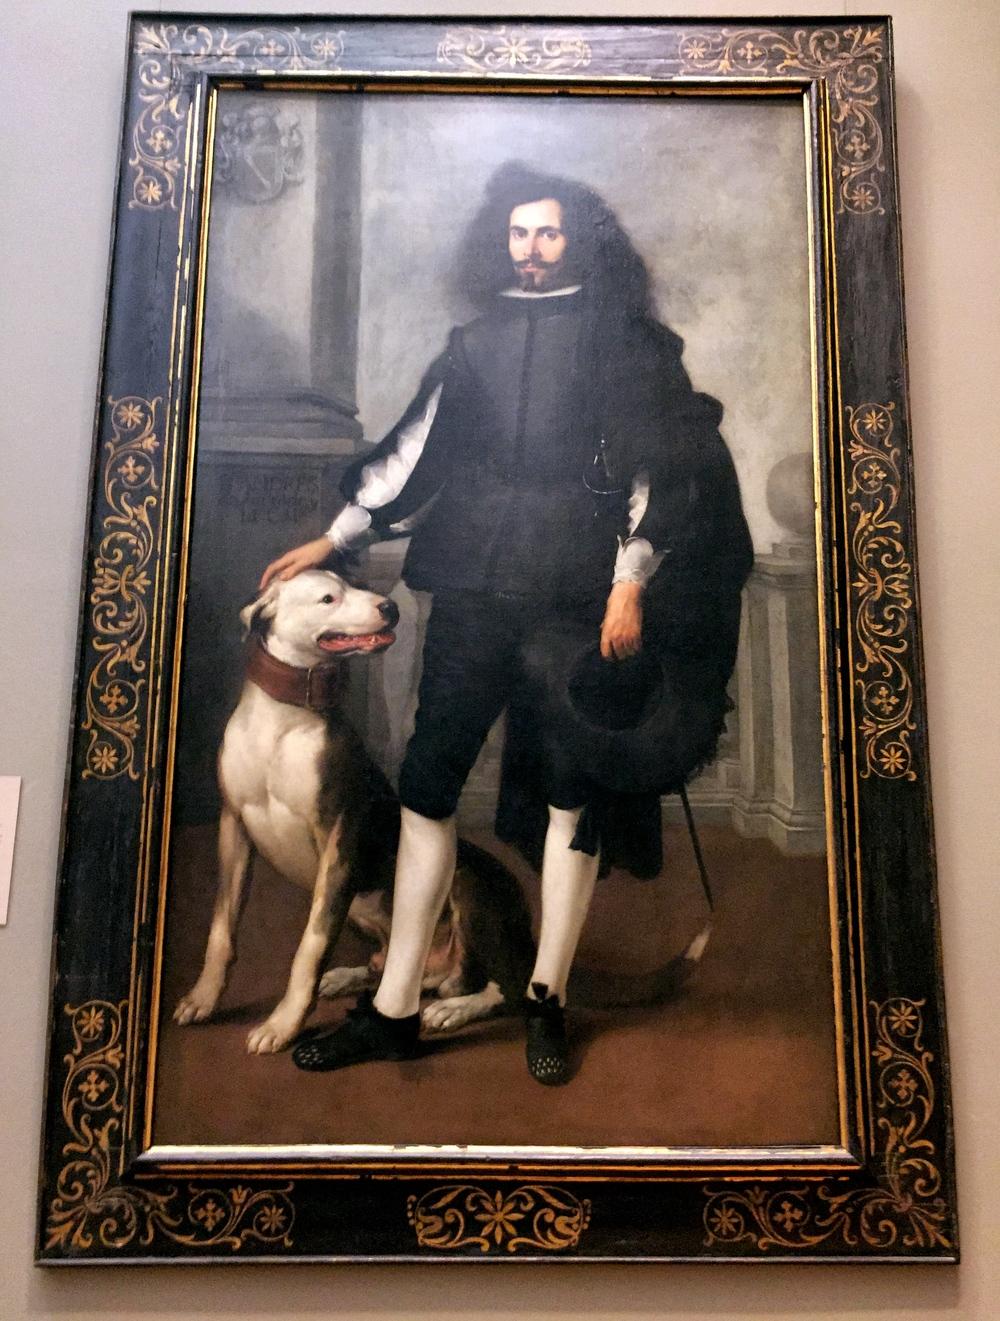 Don Andrés de Andrade y la Cal. Bartolomé Estebán Murillo. (Spanish, Seville 1617–1682 Seville) ca. 1665-72. Oil on canvas.